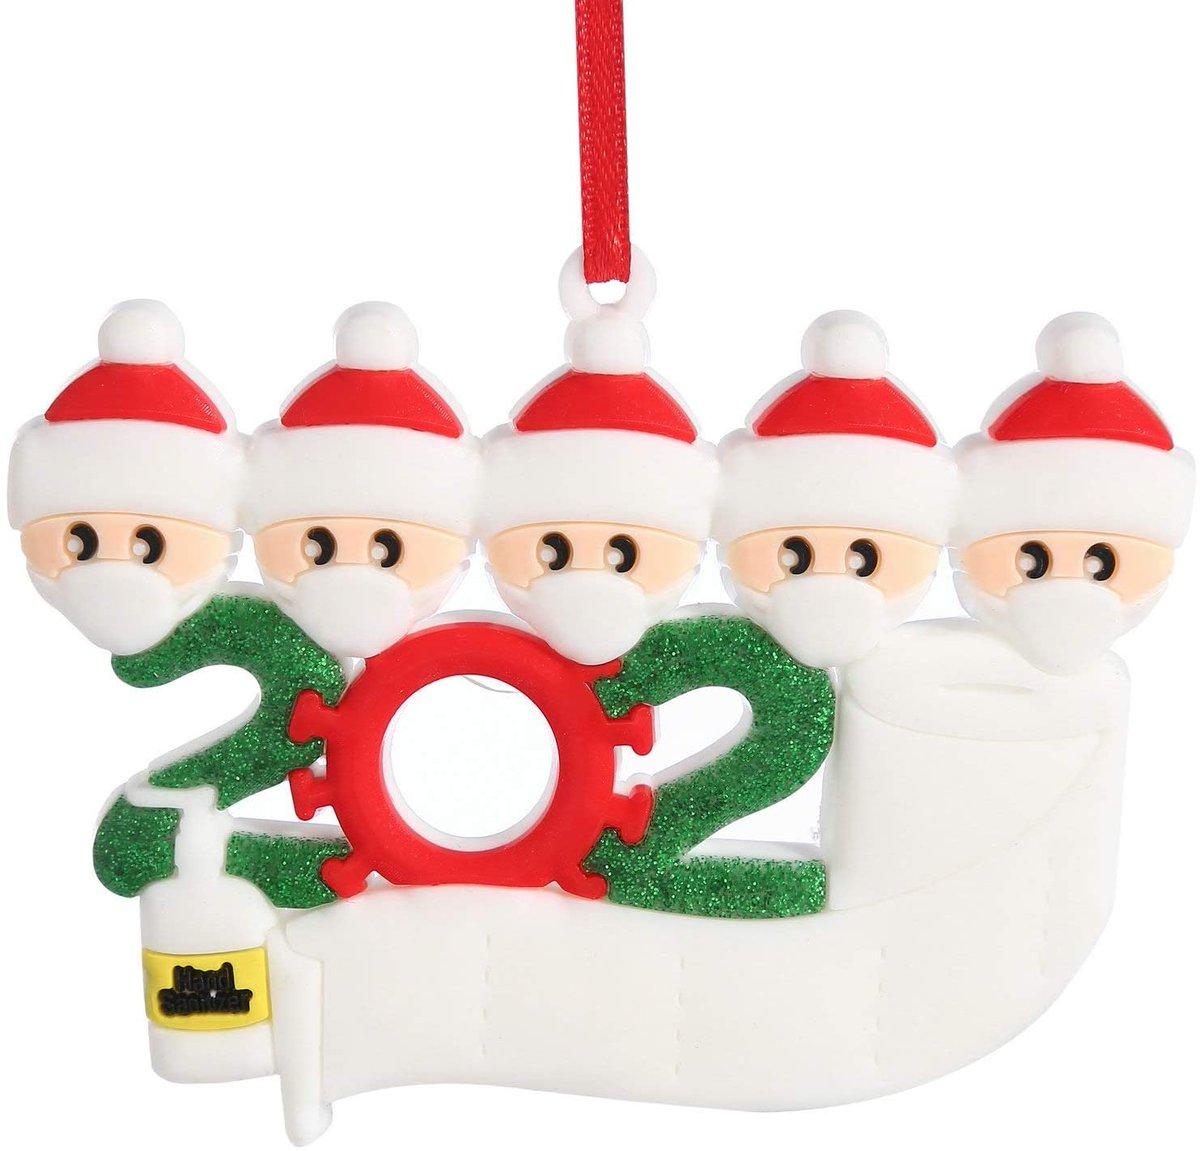 Quarantine Family 2020 Christmas Ornament Kit  Only $5.99!!  2